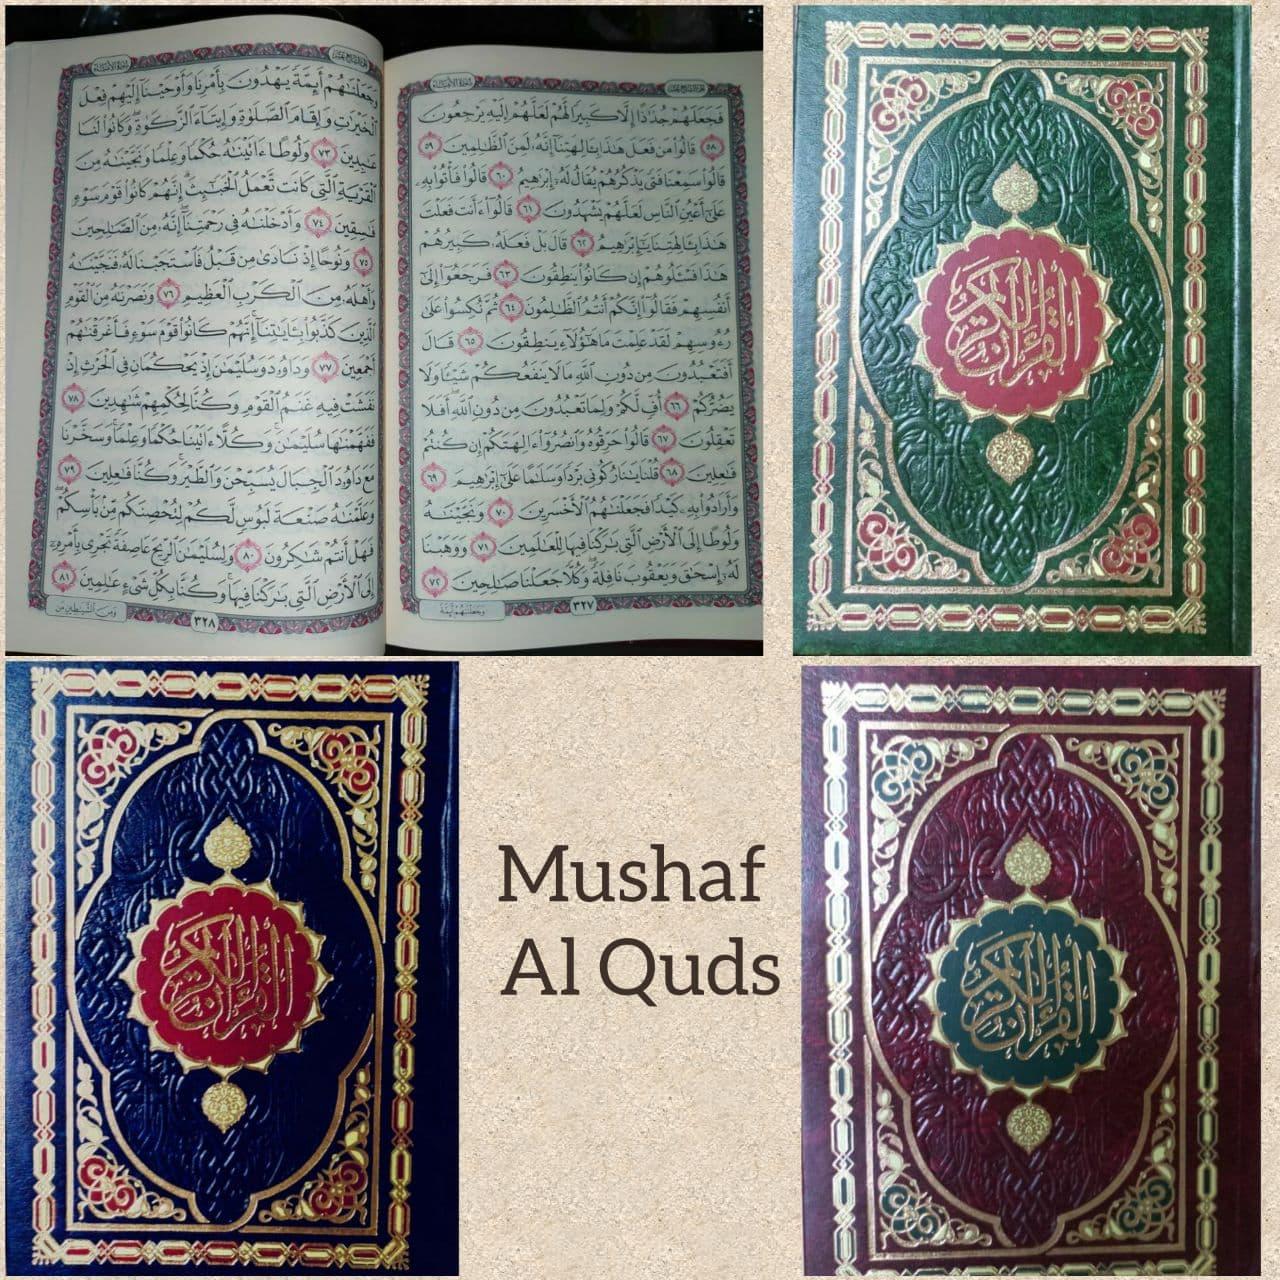 Mushaf Al Quran Al Quds Mesir 14 x 20